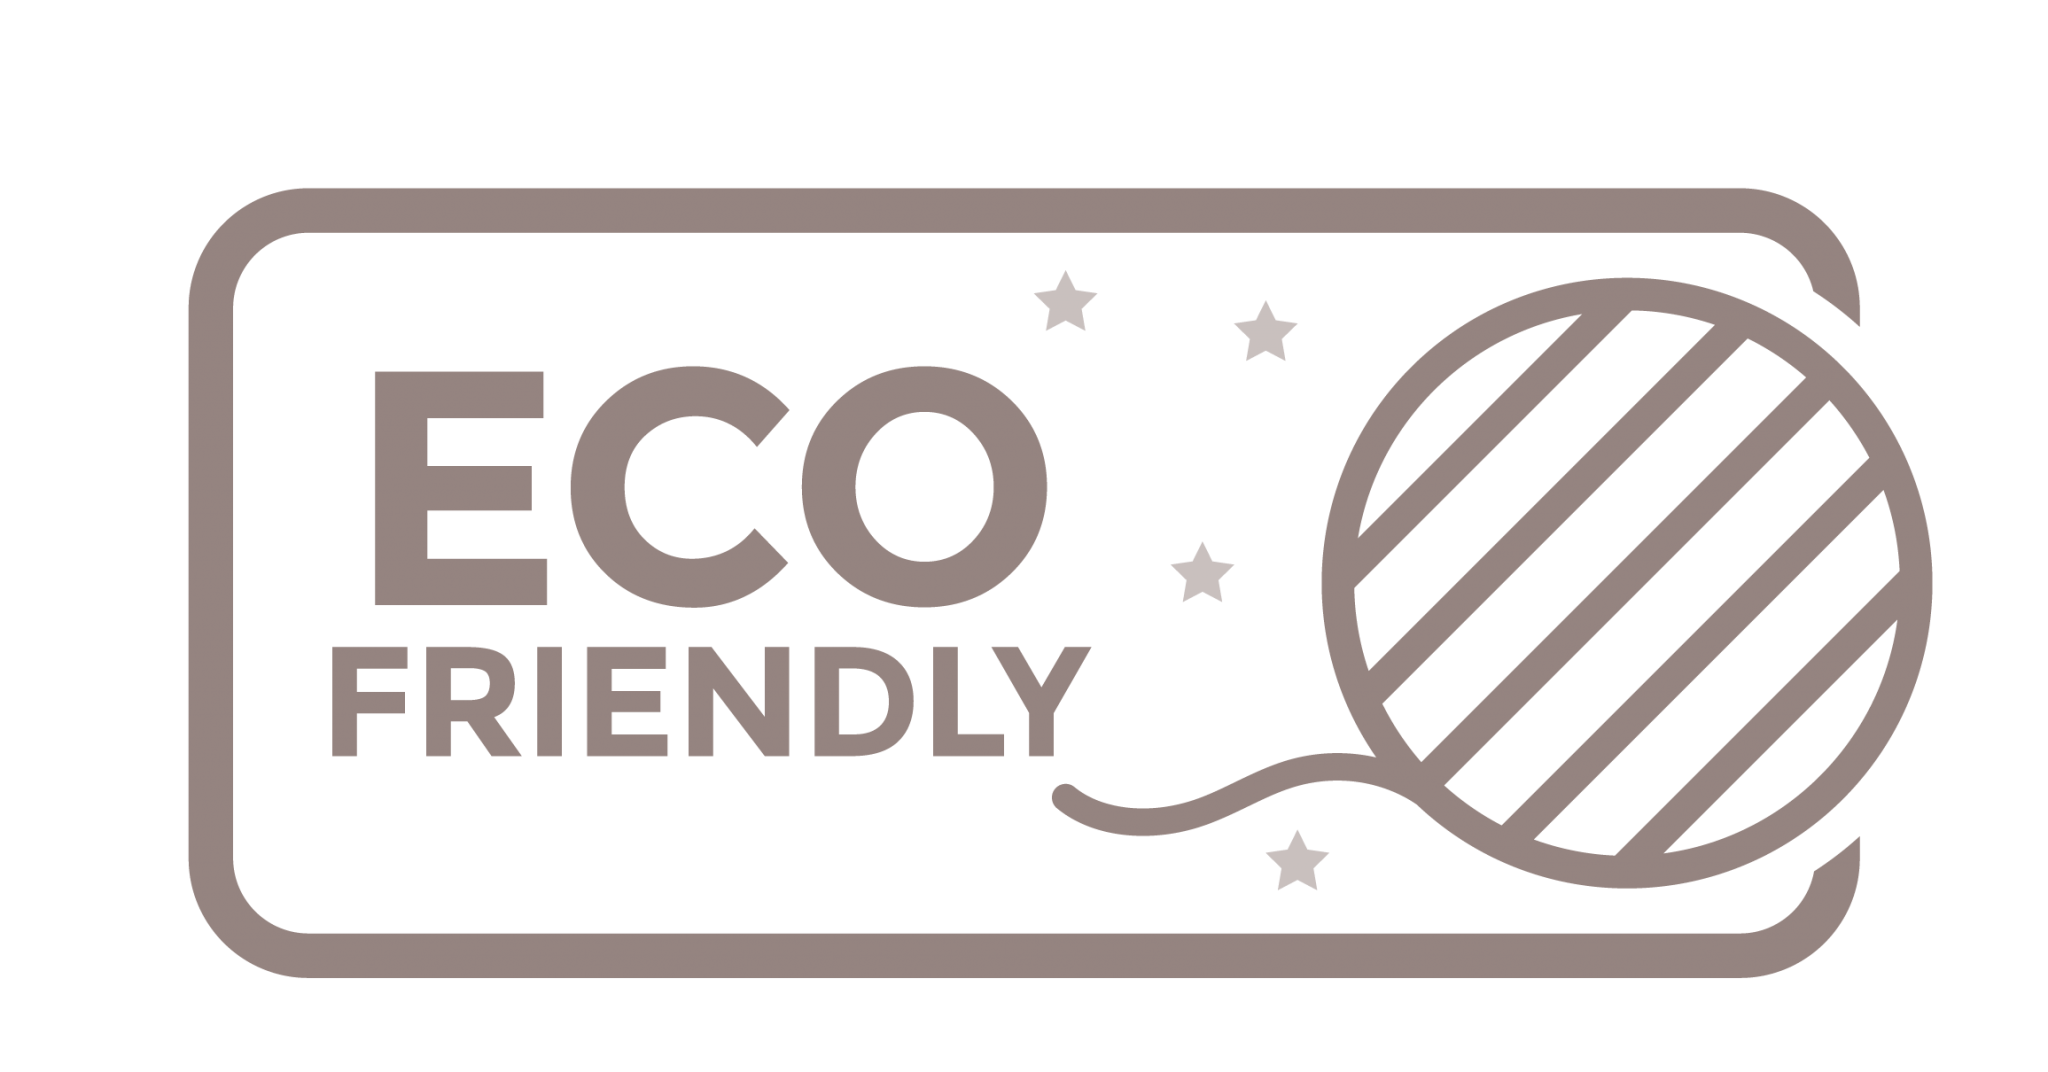 eco_friendly_stamp